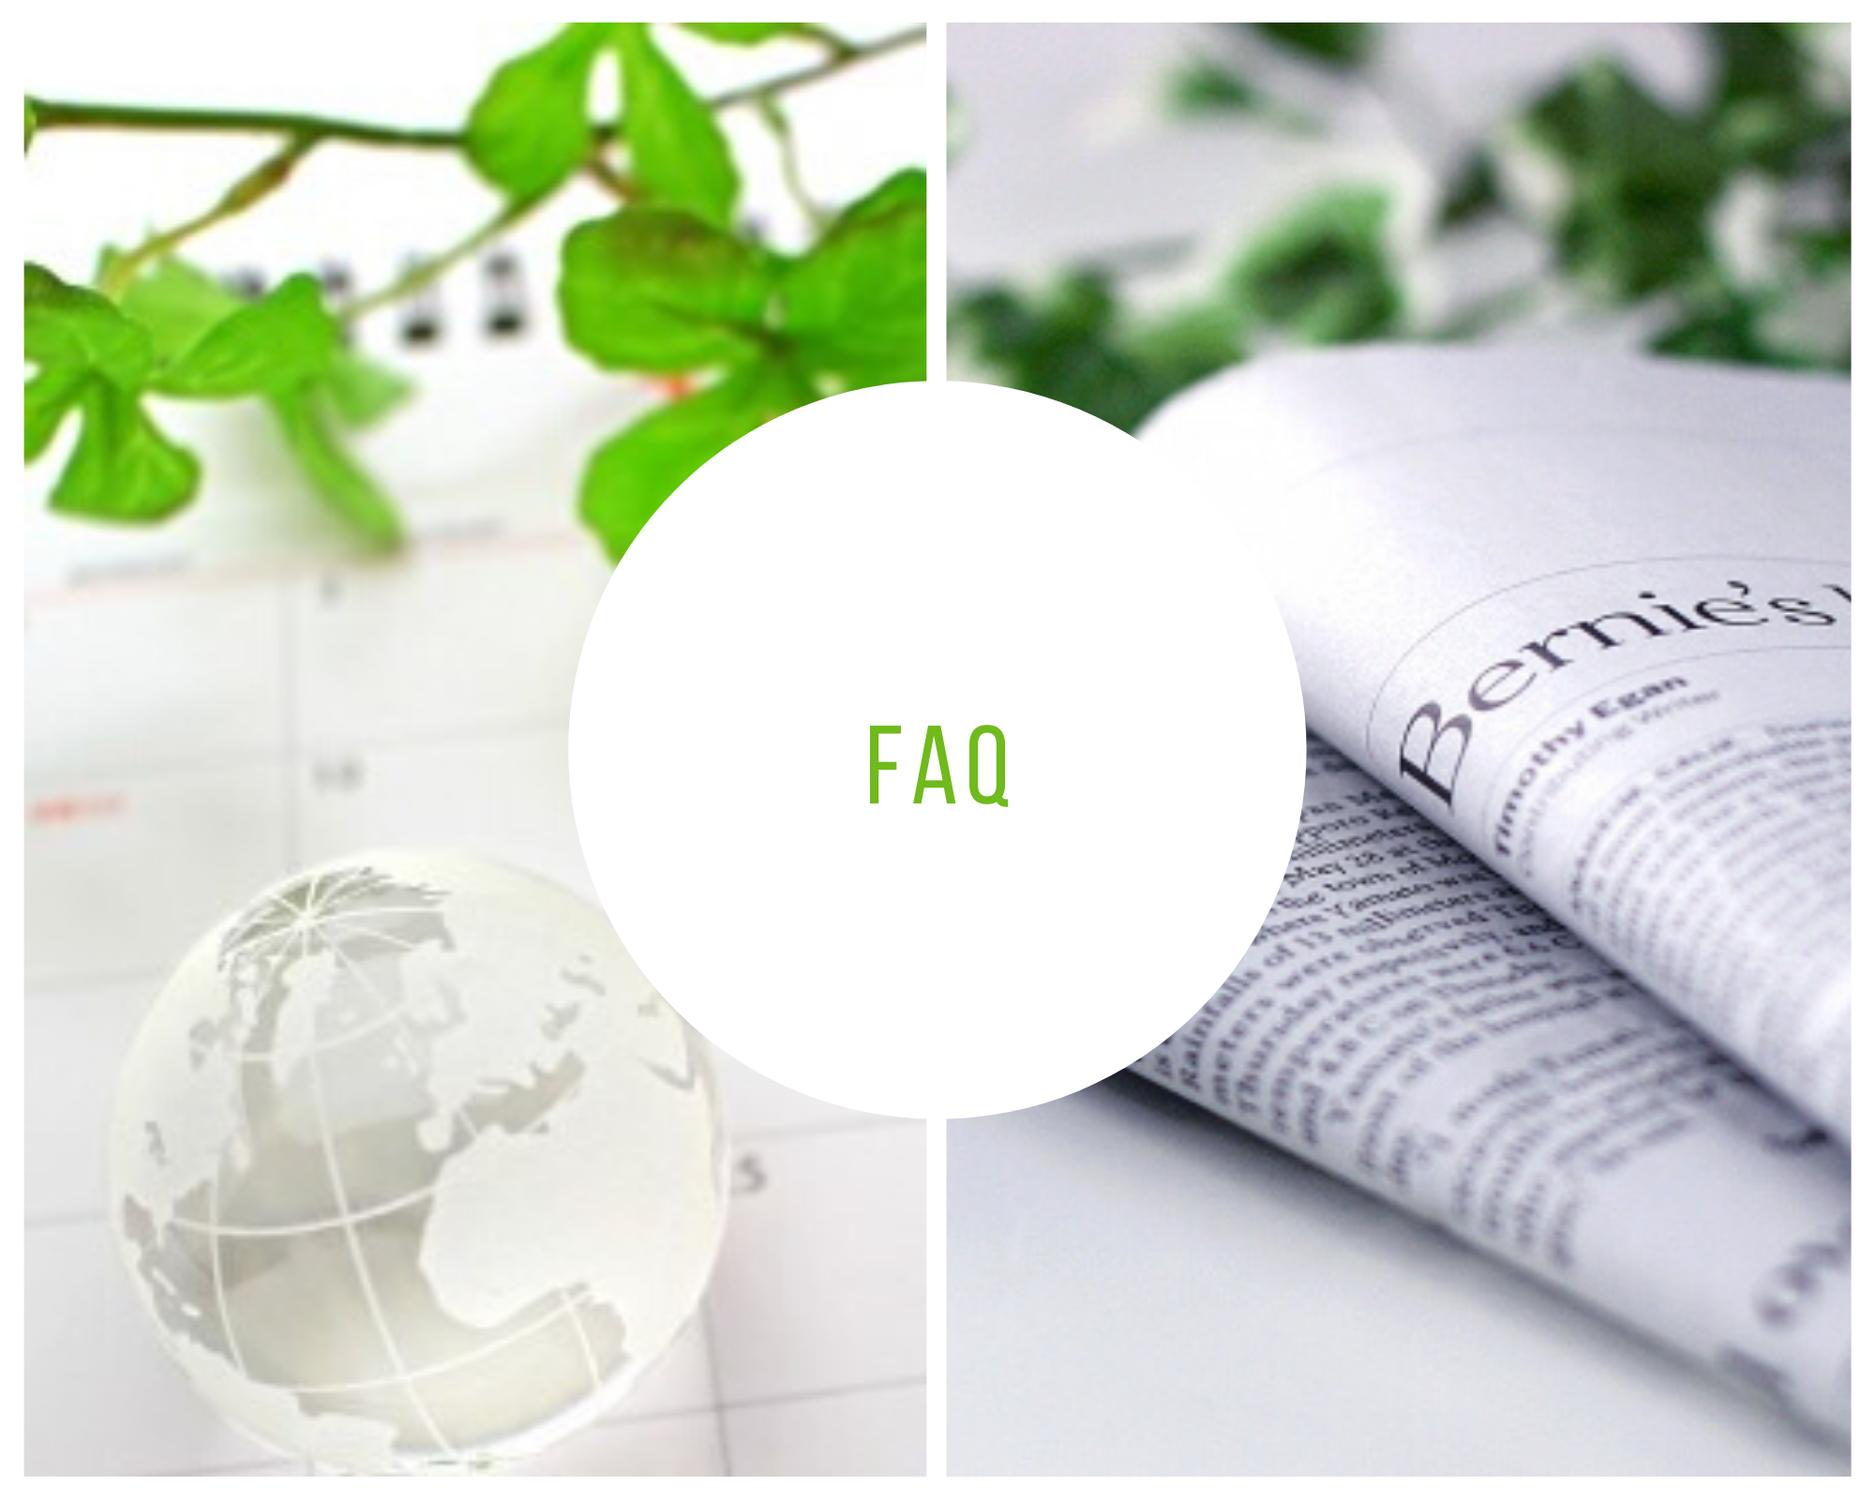 What is FRESC?